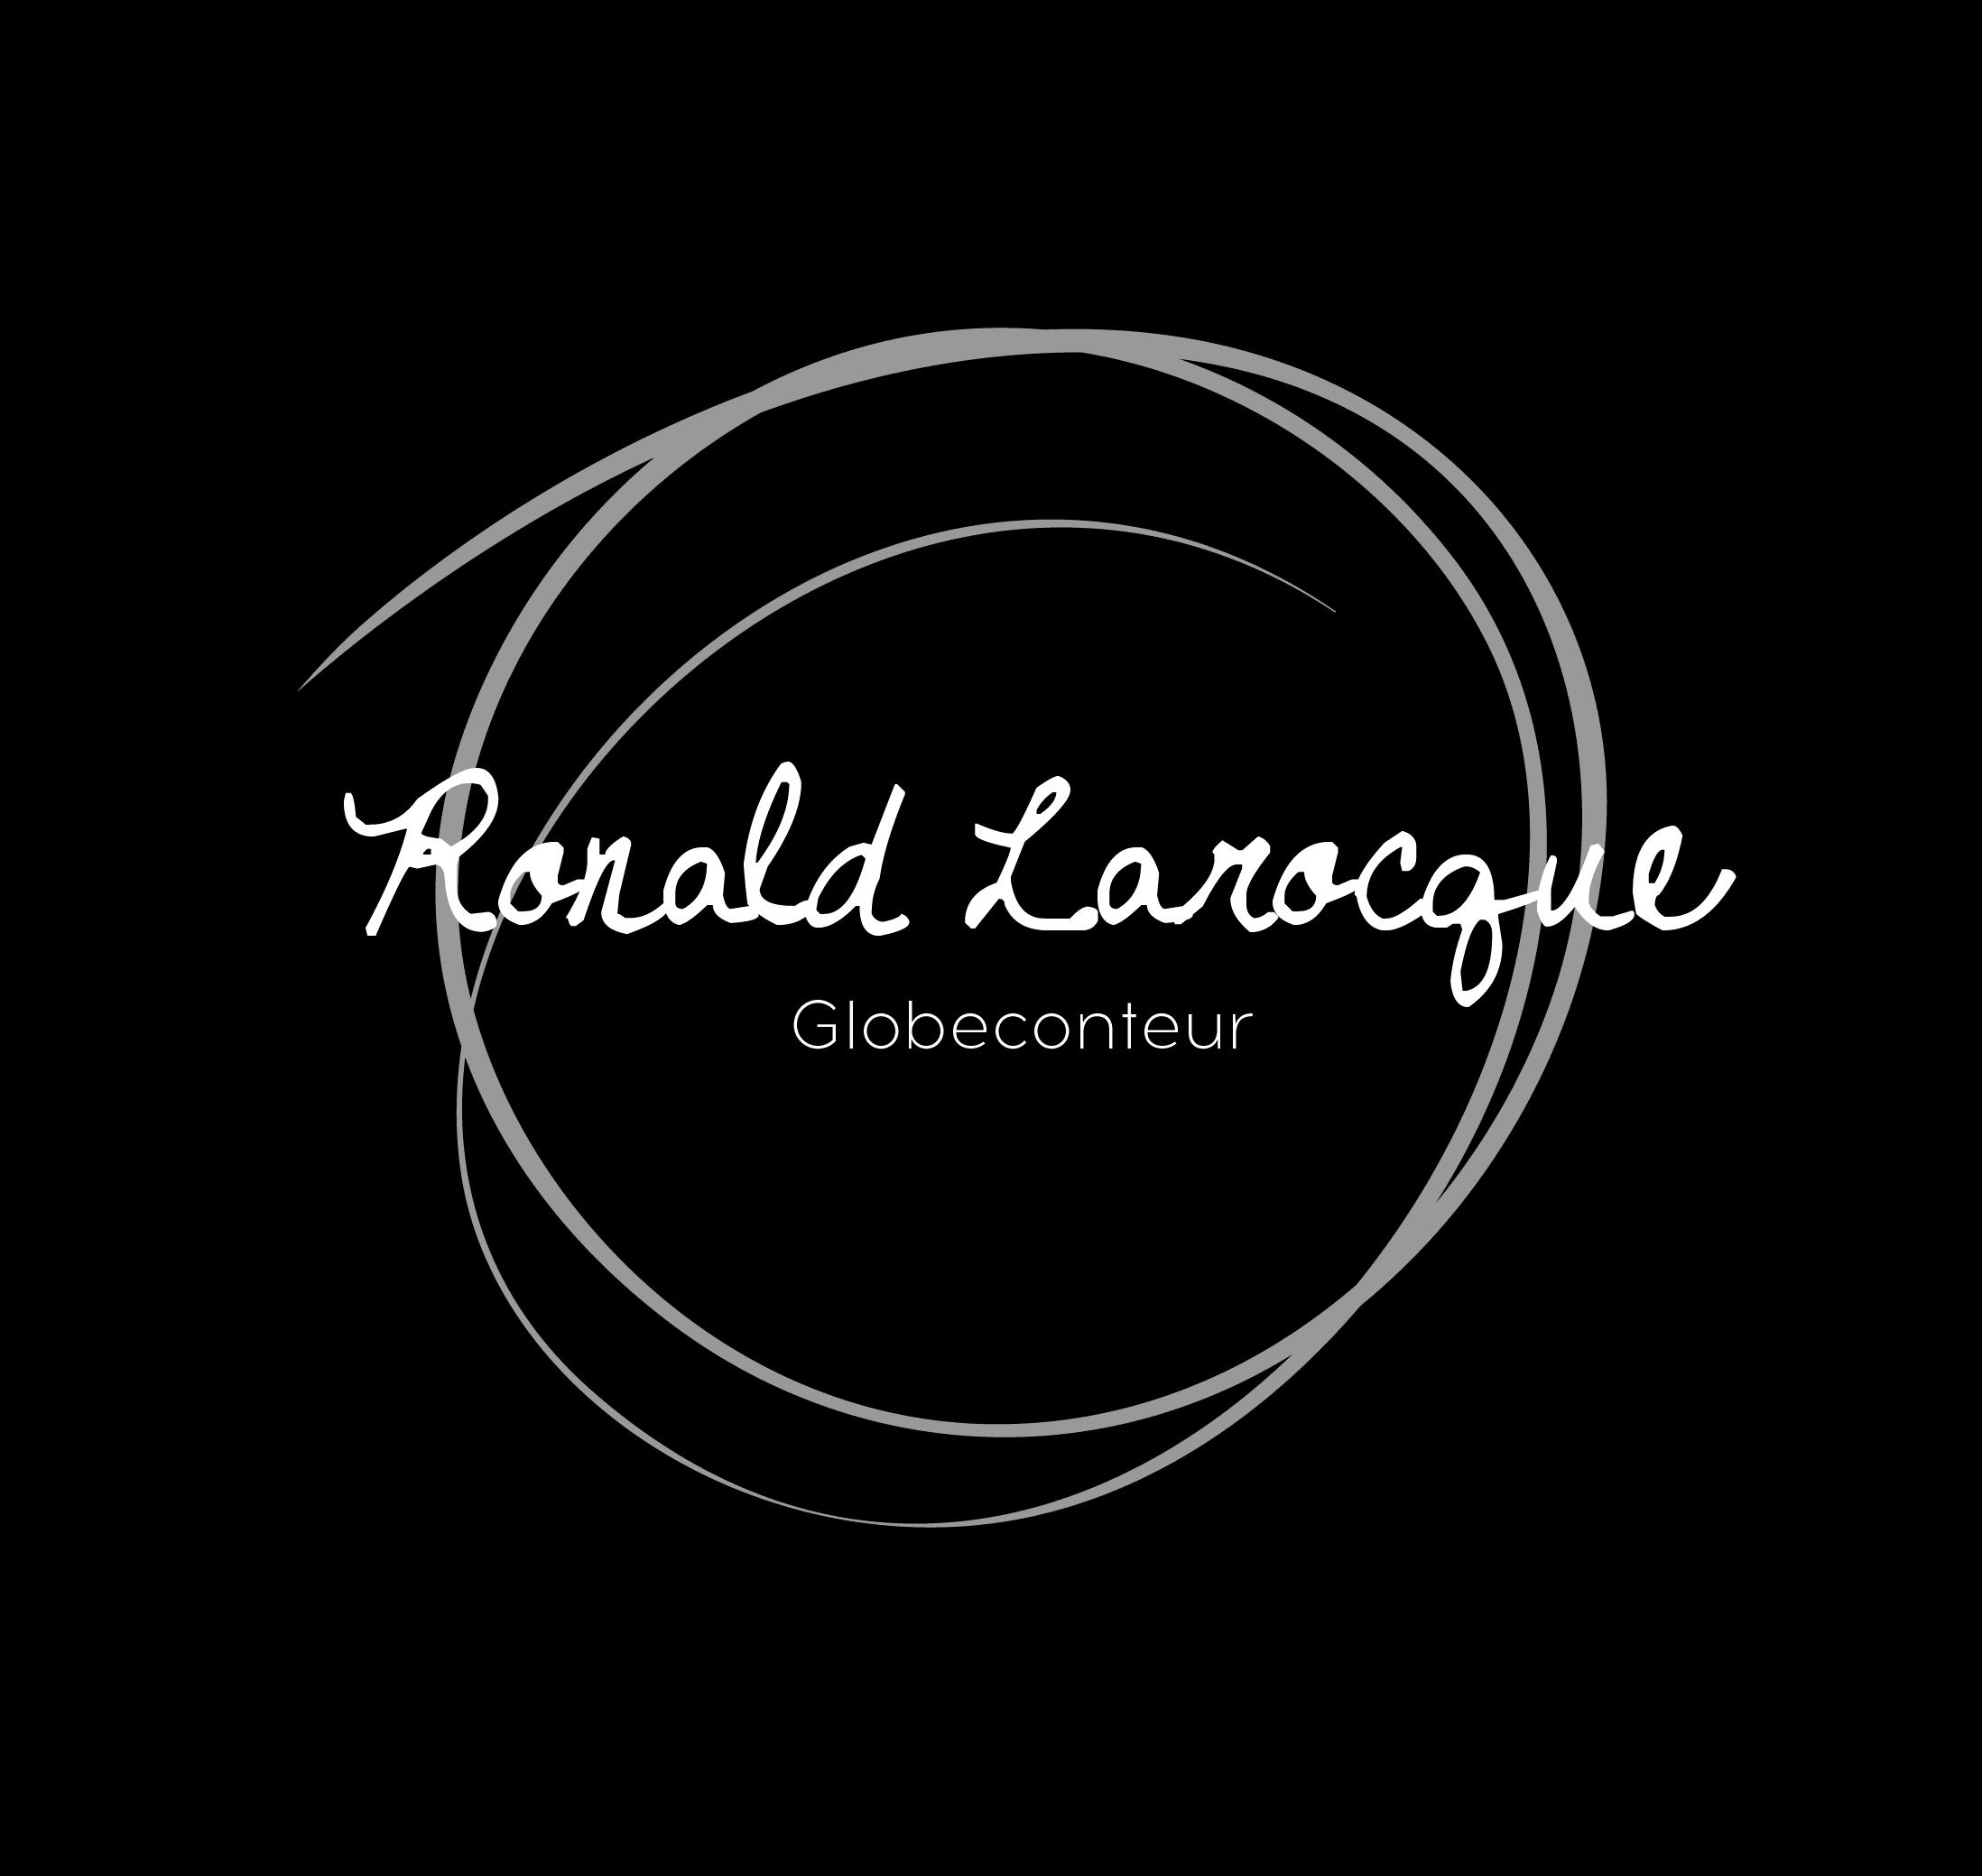 Ronald Larocque